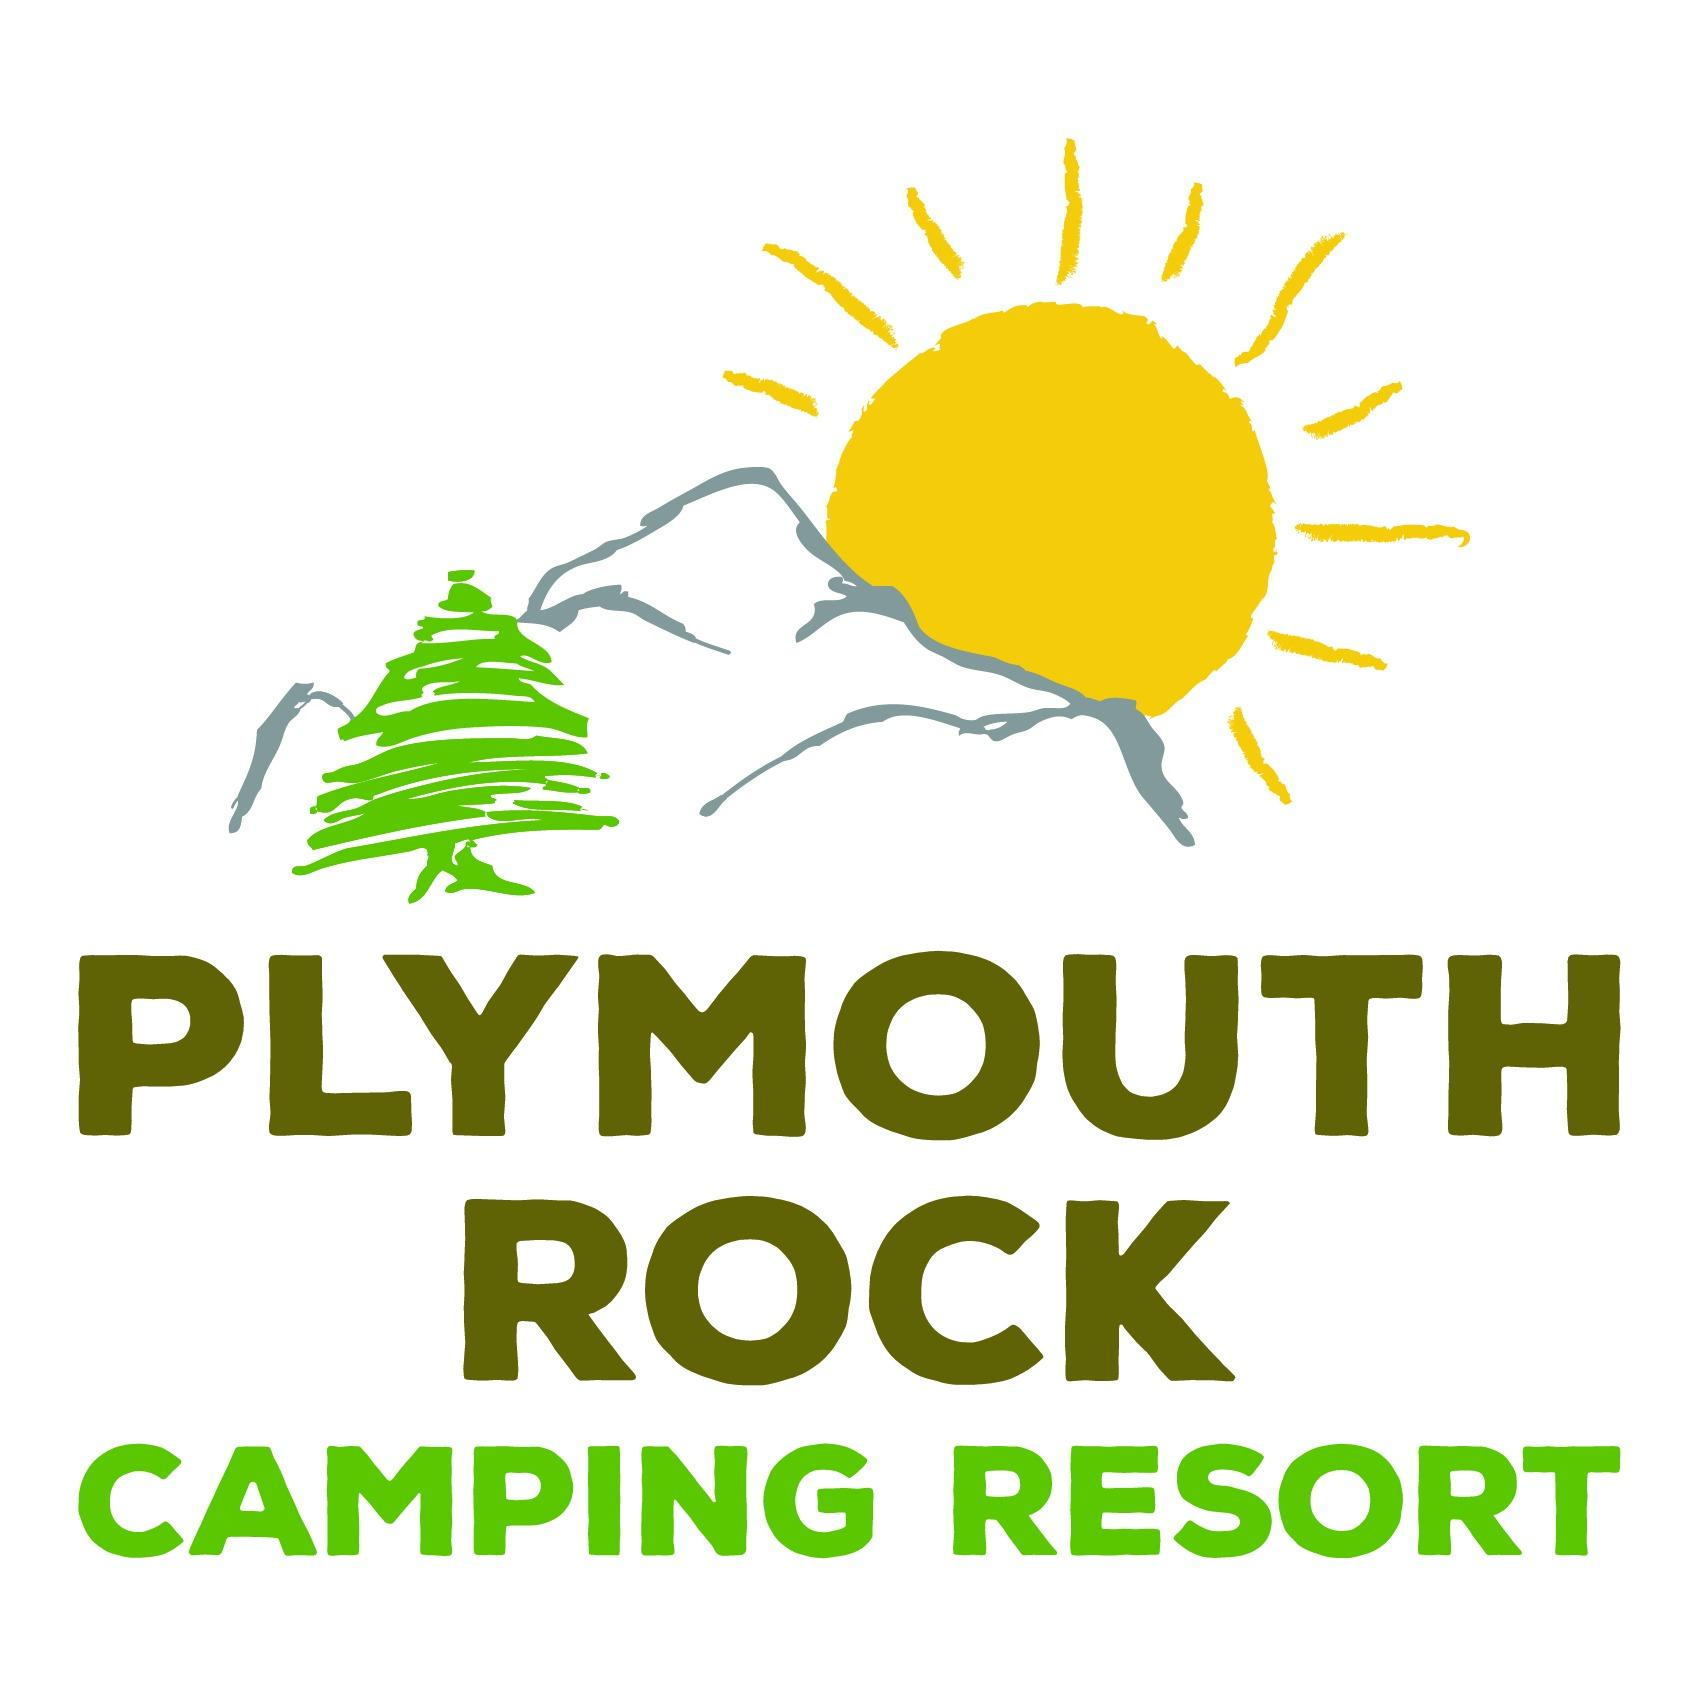 Plymouth Rock Camping Resort